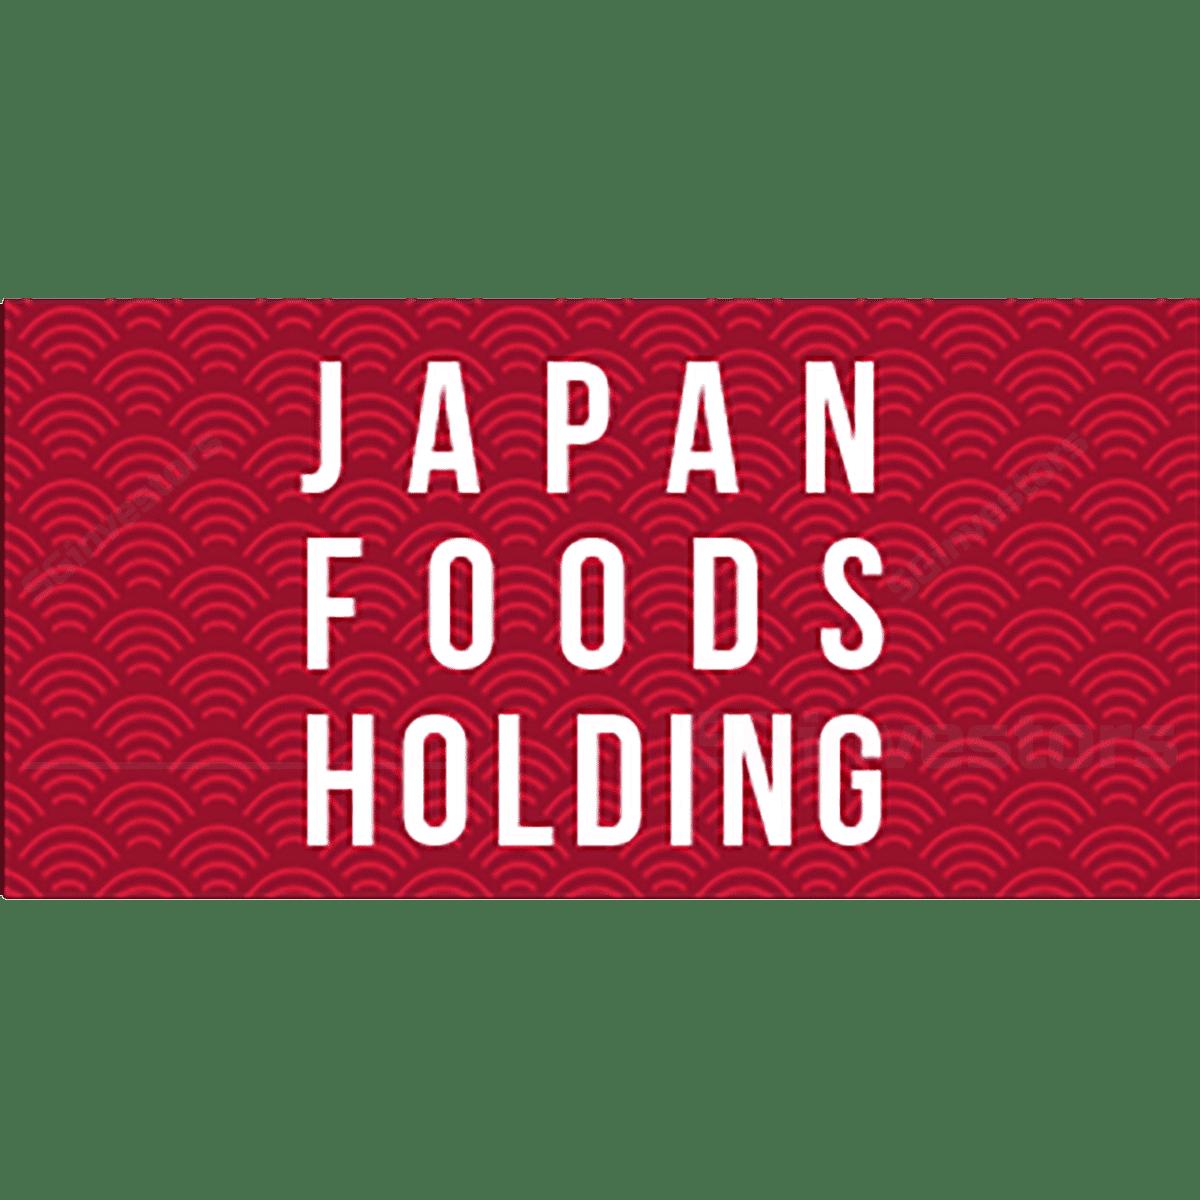 Japan Foods Holding